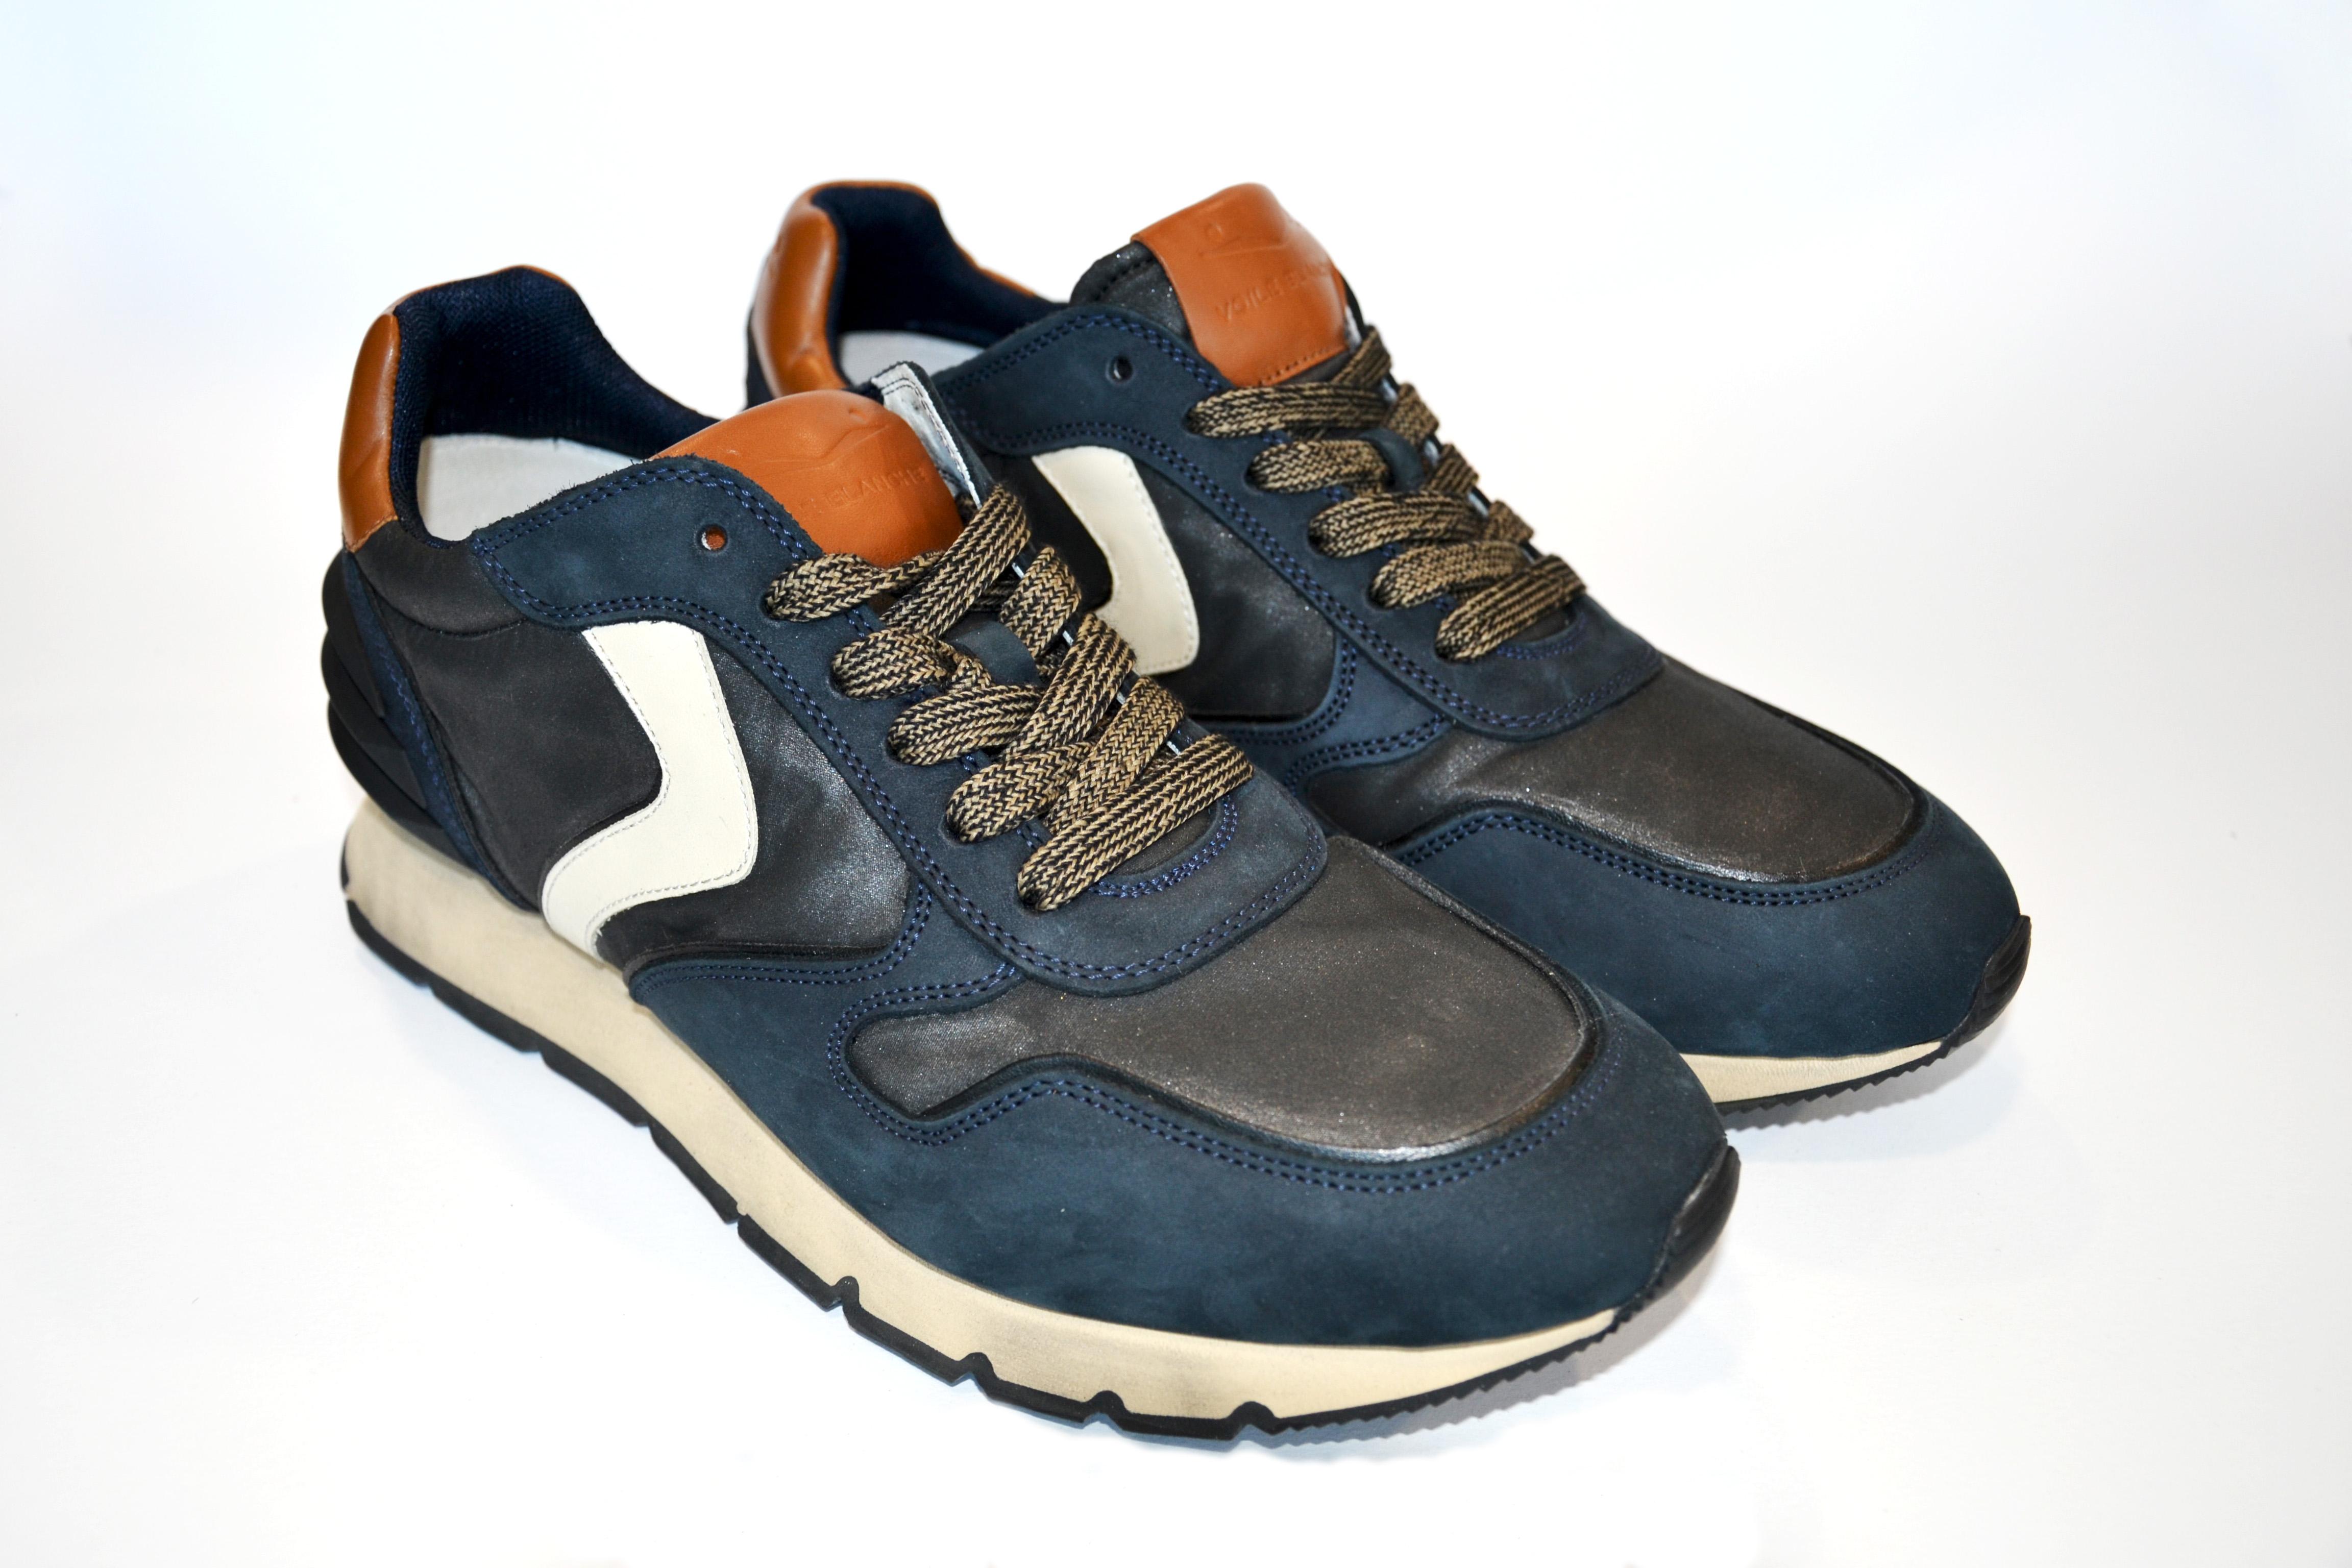 Voile Blanche Scarpa Uomo Sneakers Liam Power Nabuk/Waxed/Nylon Blu/Nero/Denim 0012014143.1C35